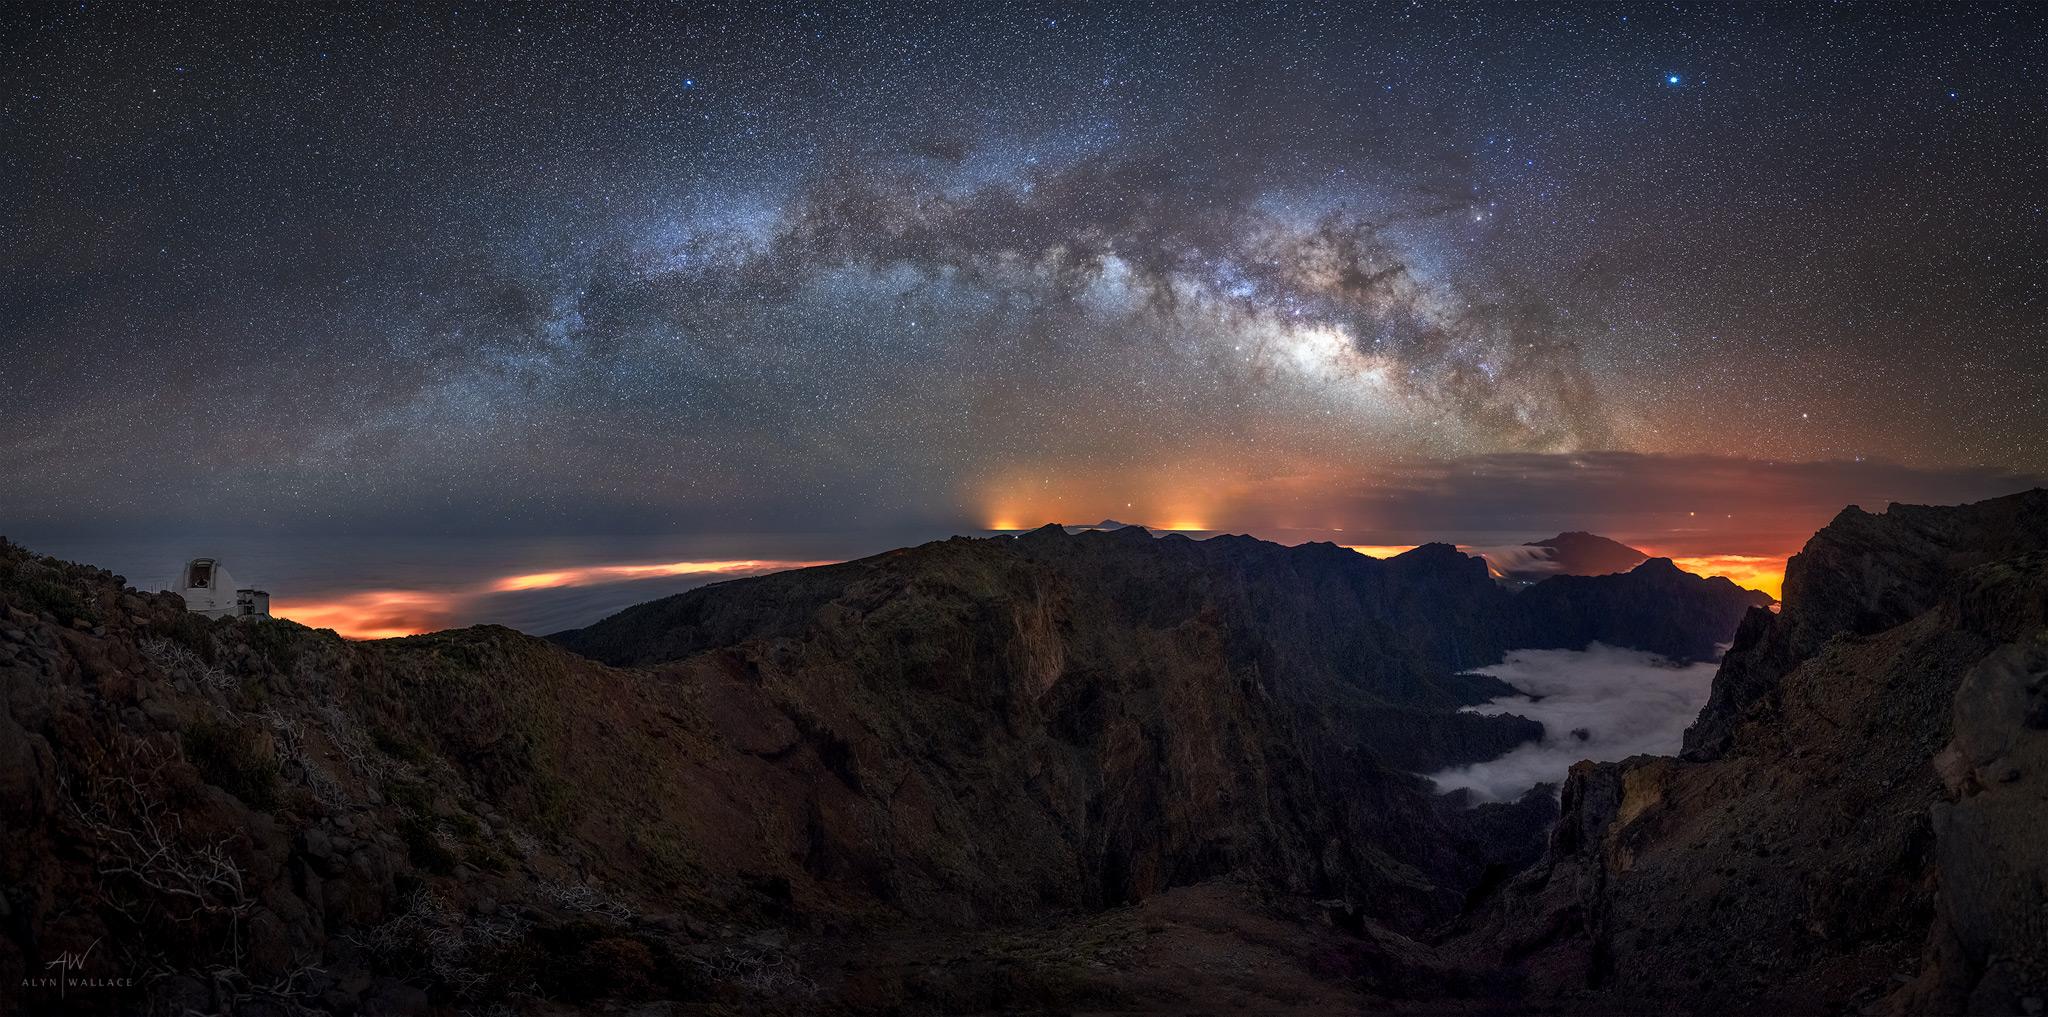 Caldera-La-Palma-Starlight-Reserve.jpg